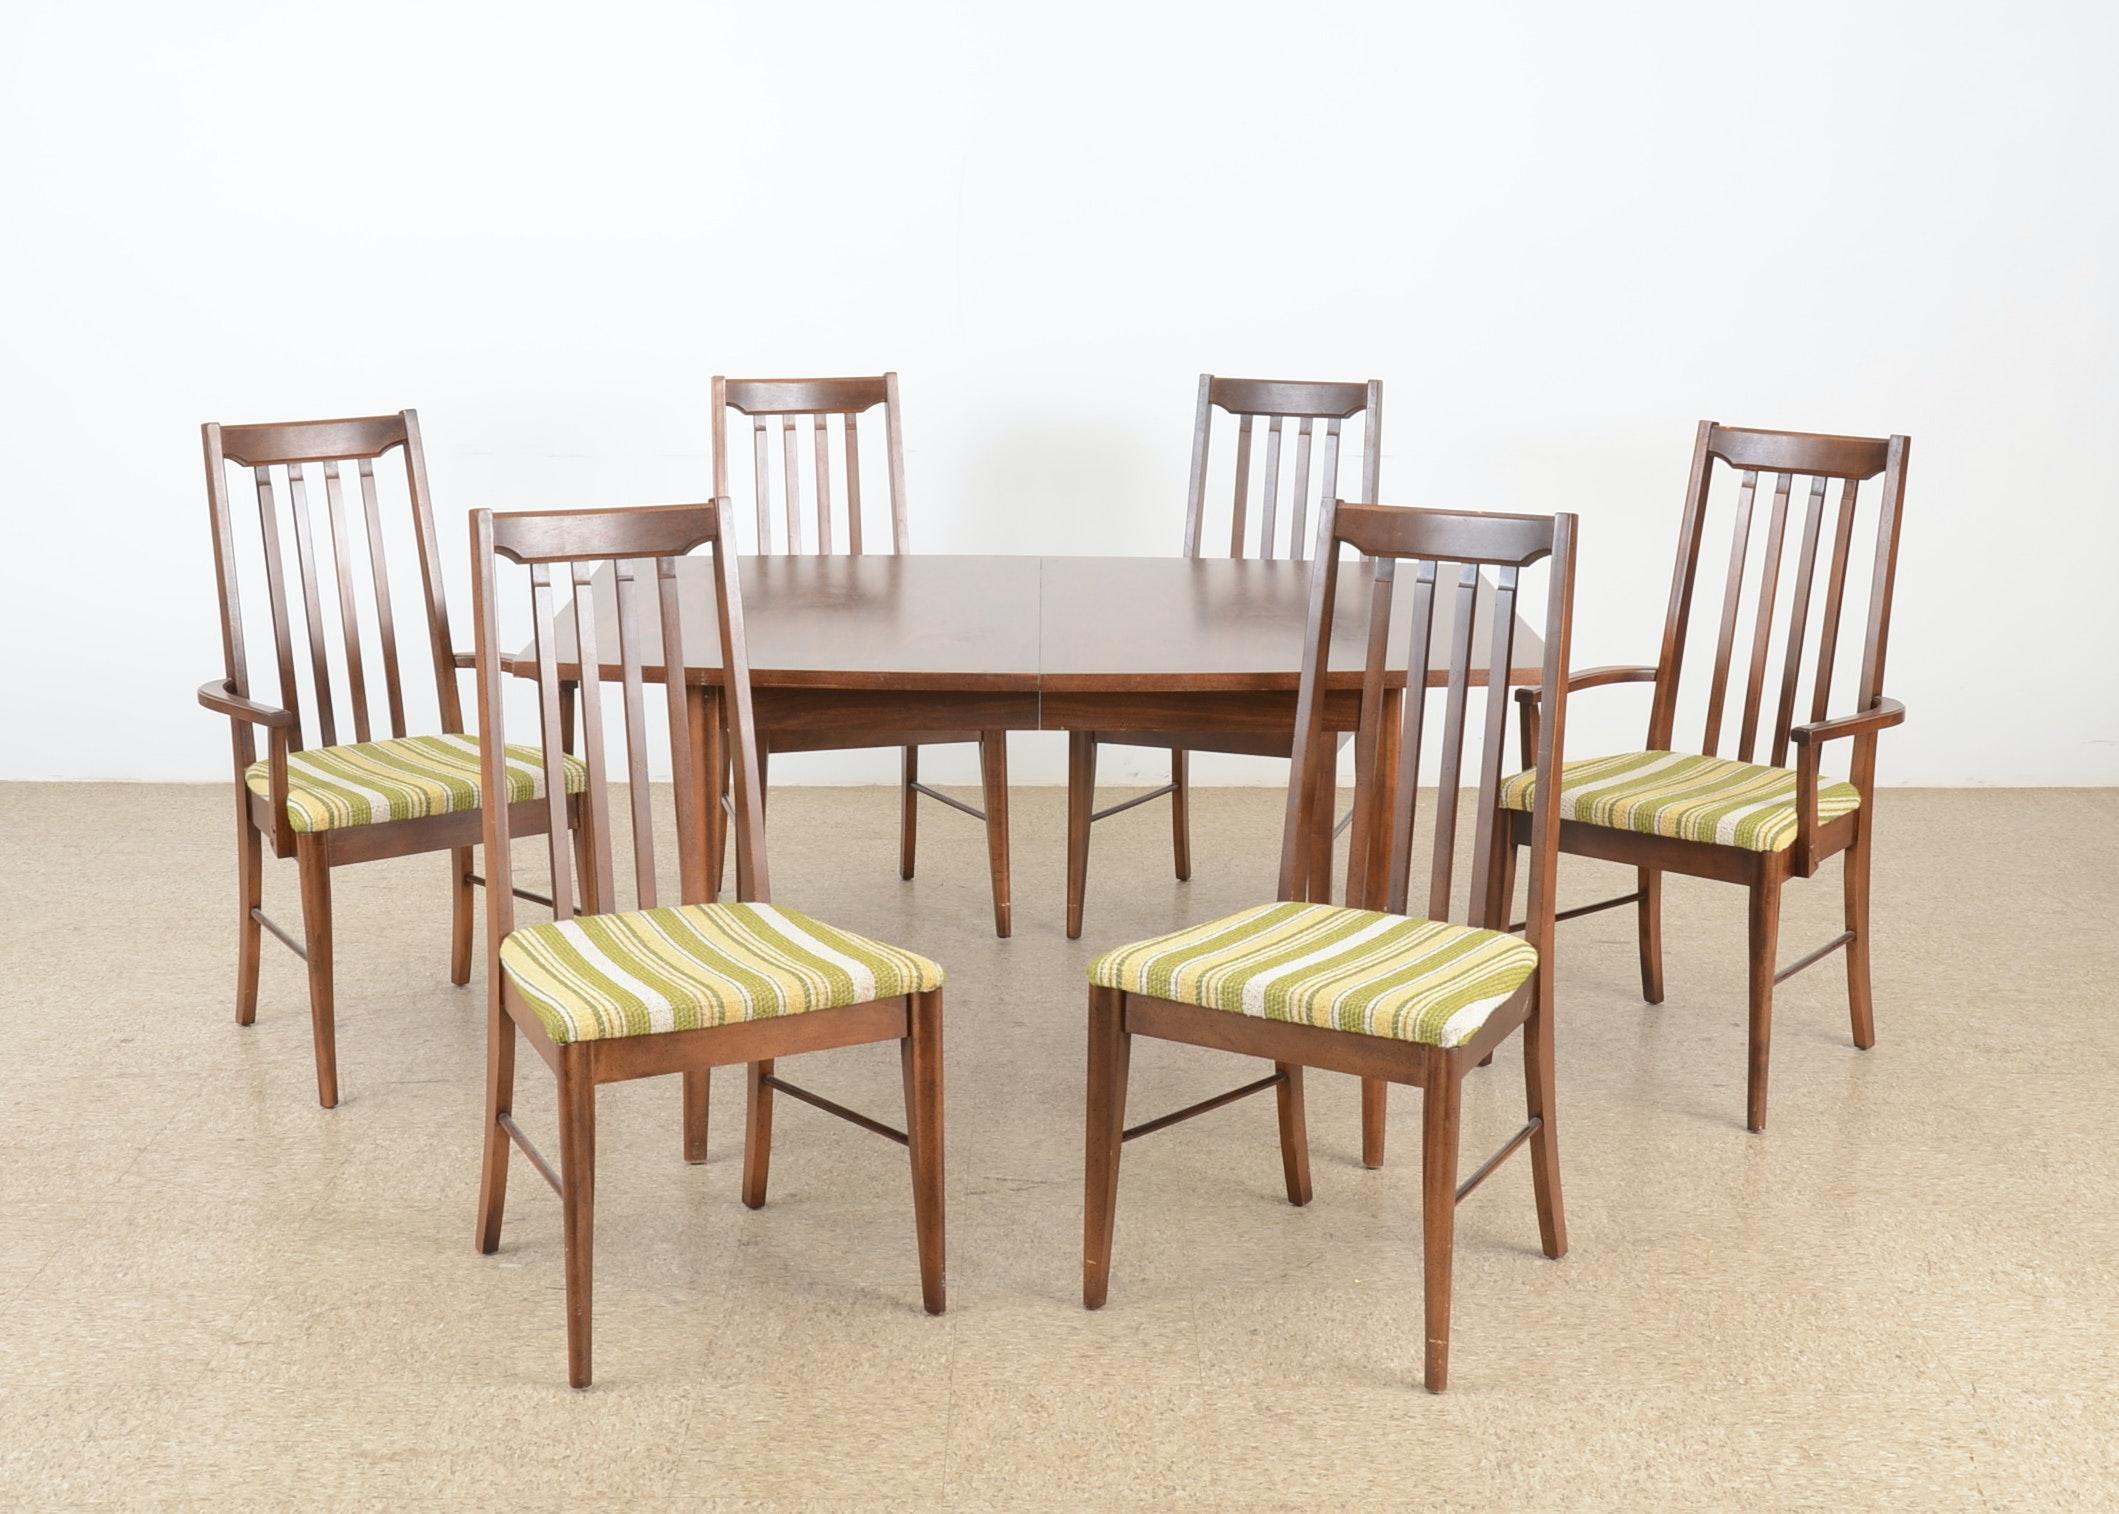 broyhill furniture dining room set circa 1950s ebth broyhill hepplewhite style federal dining room set chairish